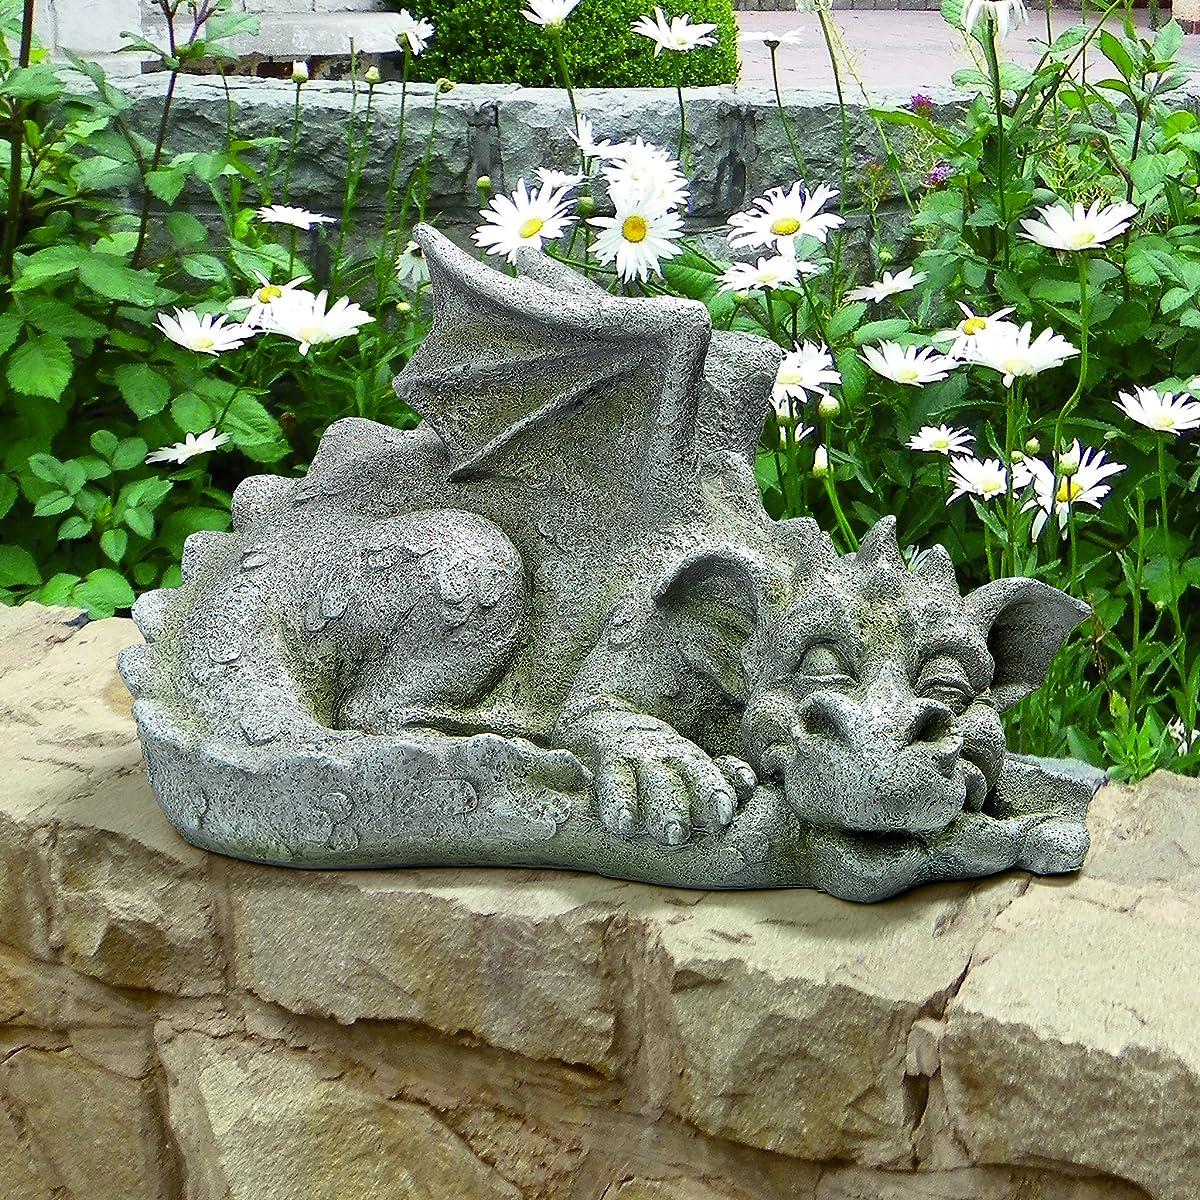 Design Toscano Blushing Babel The Bashful Dragon Statue, Medium